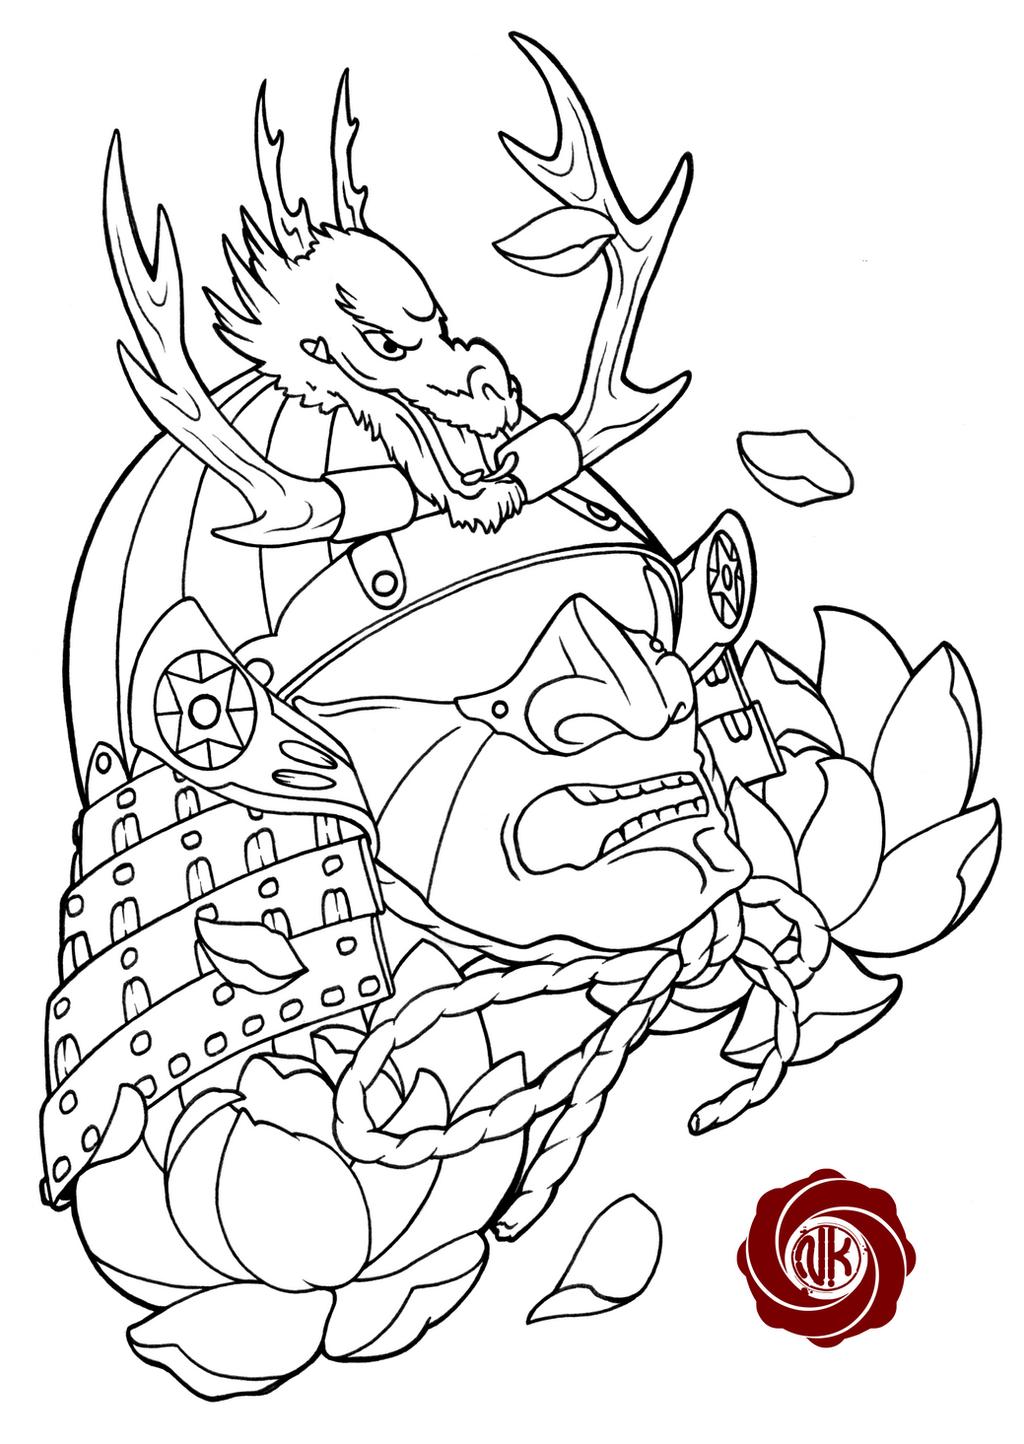 Traditional Japanese Samurai Tattoo Designs